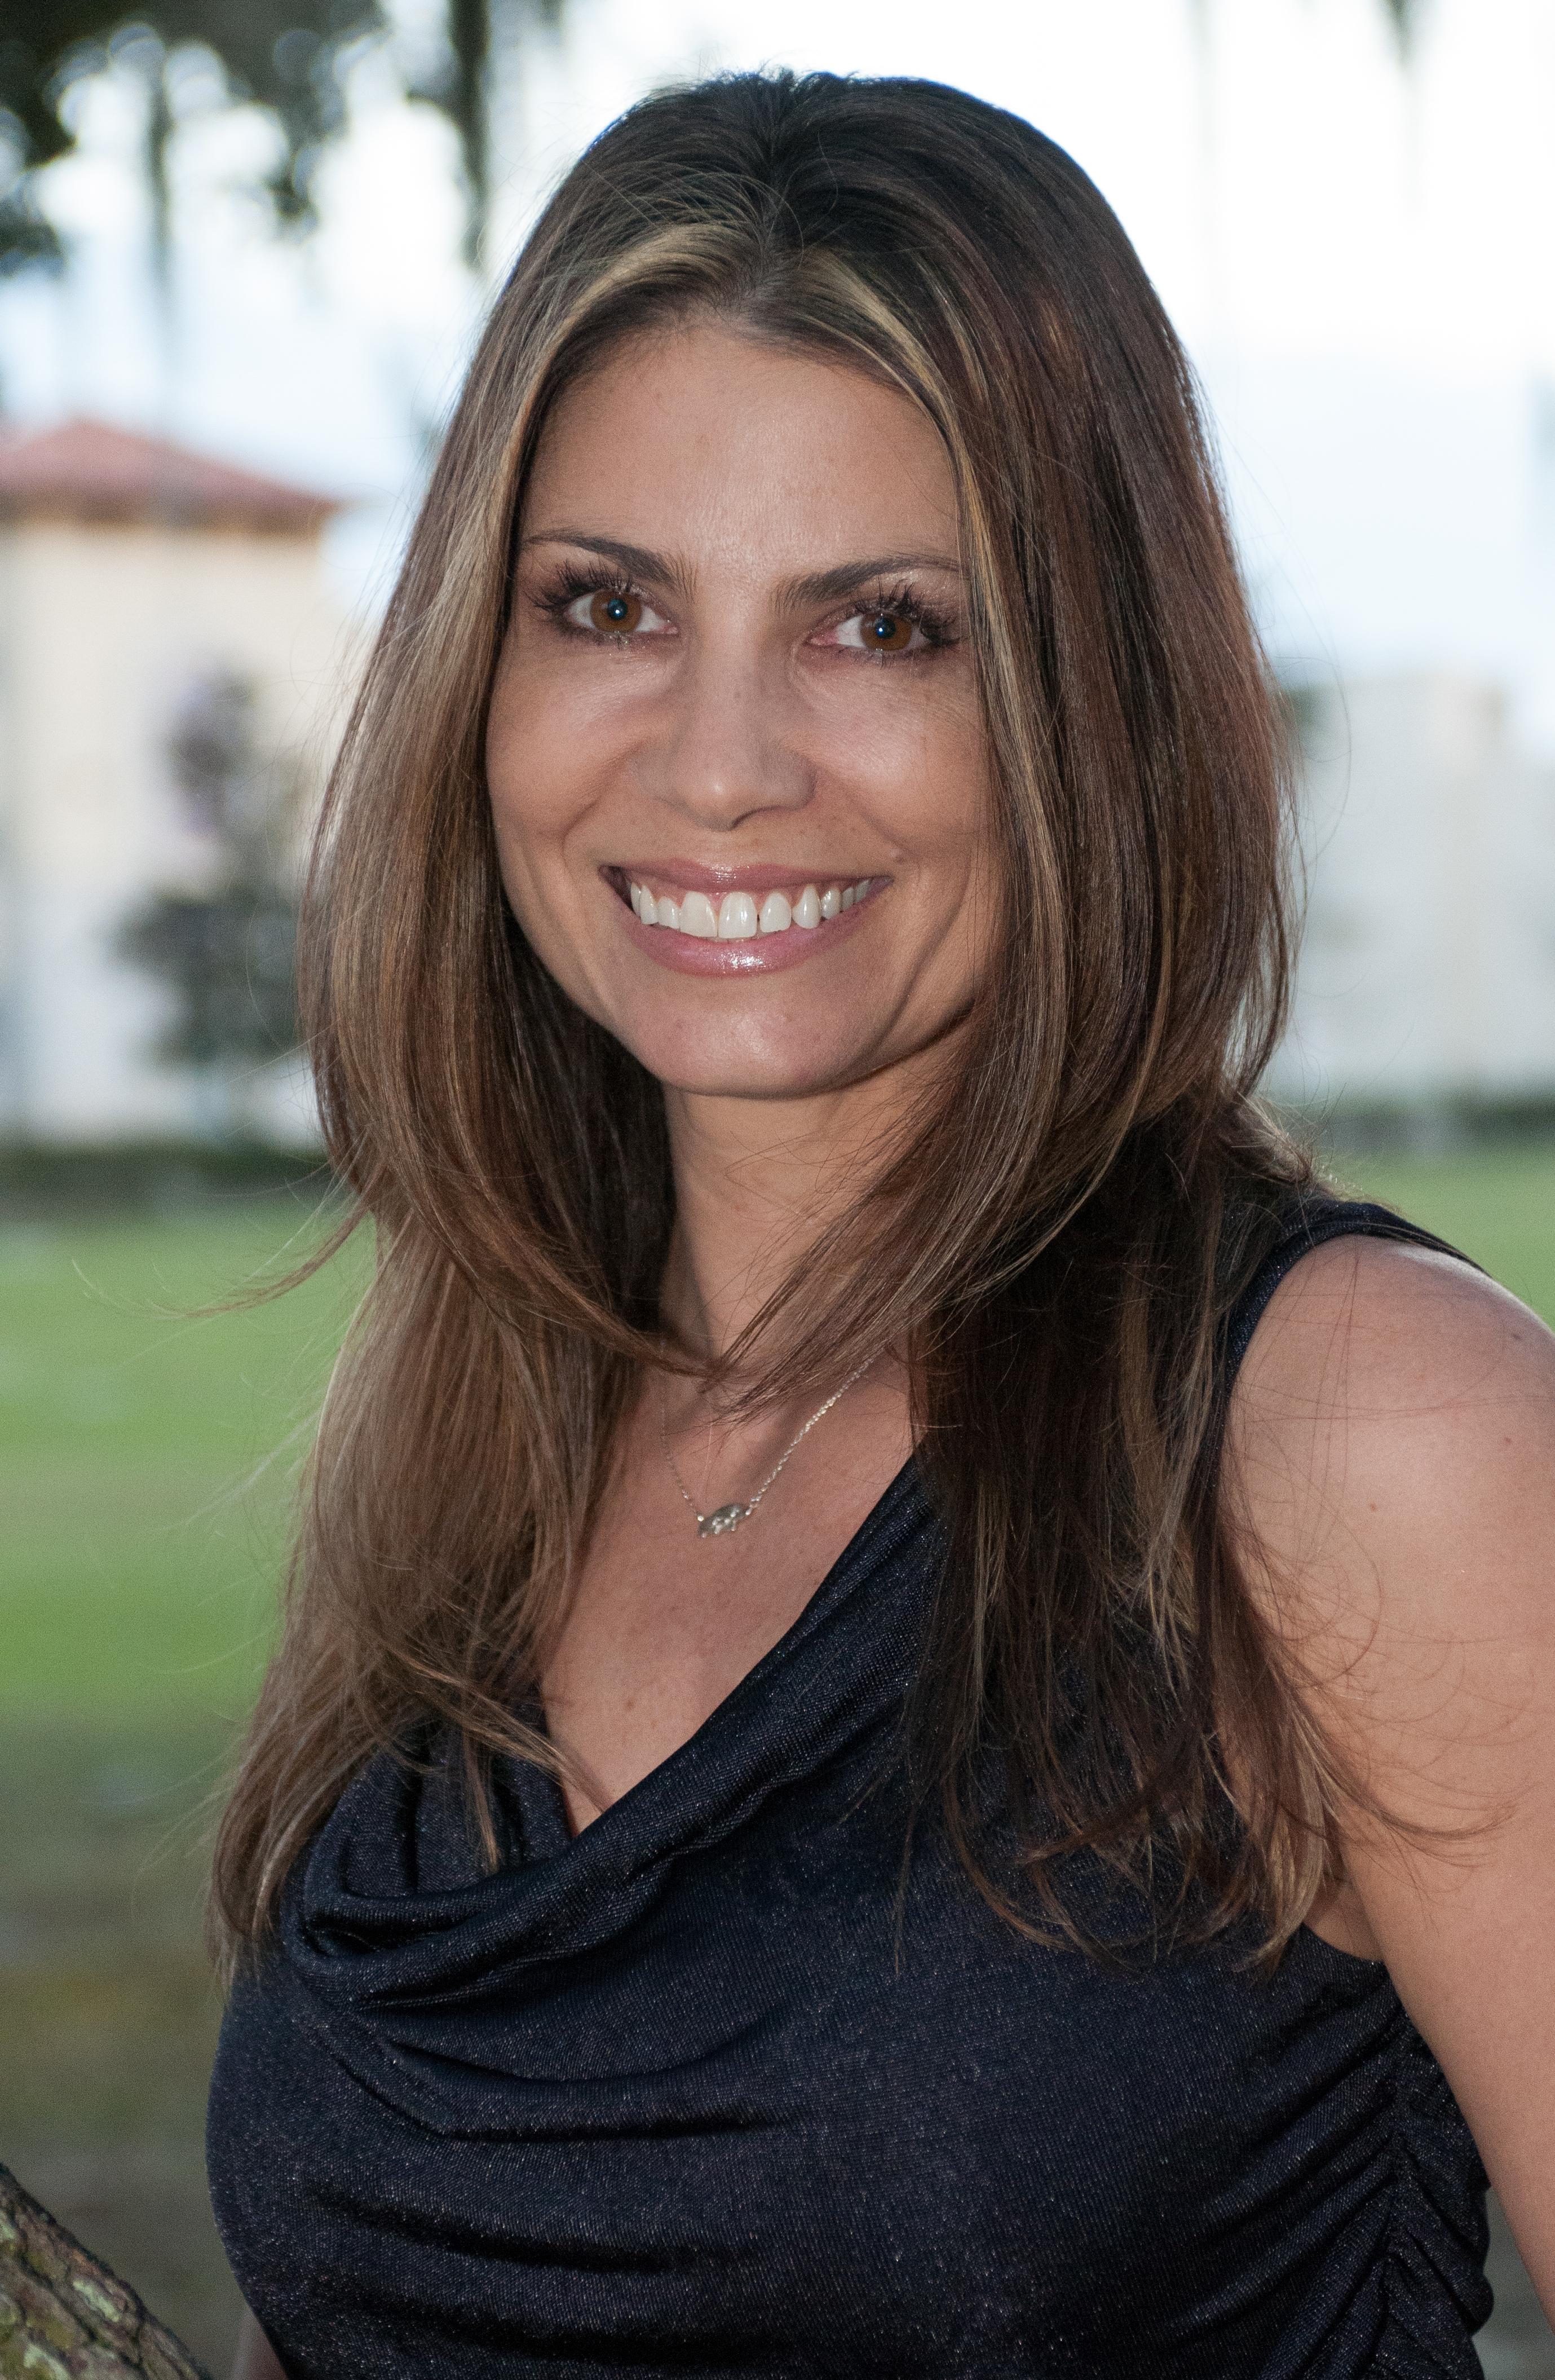 Kim Benedettini